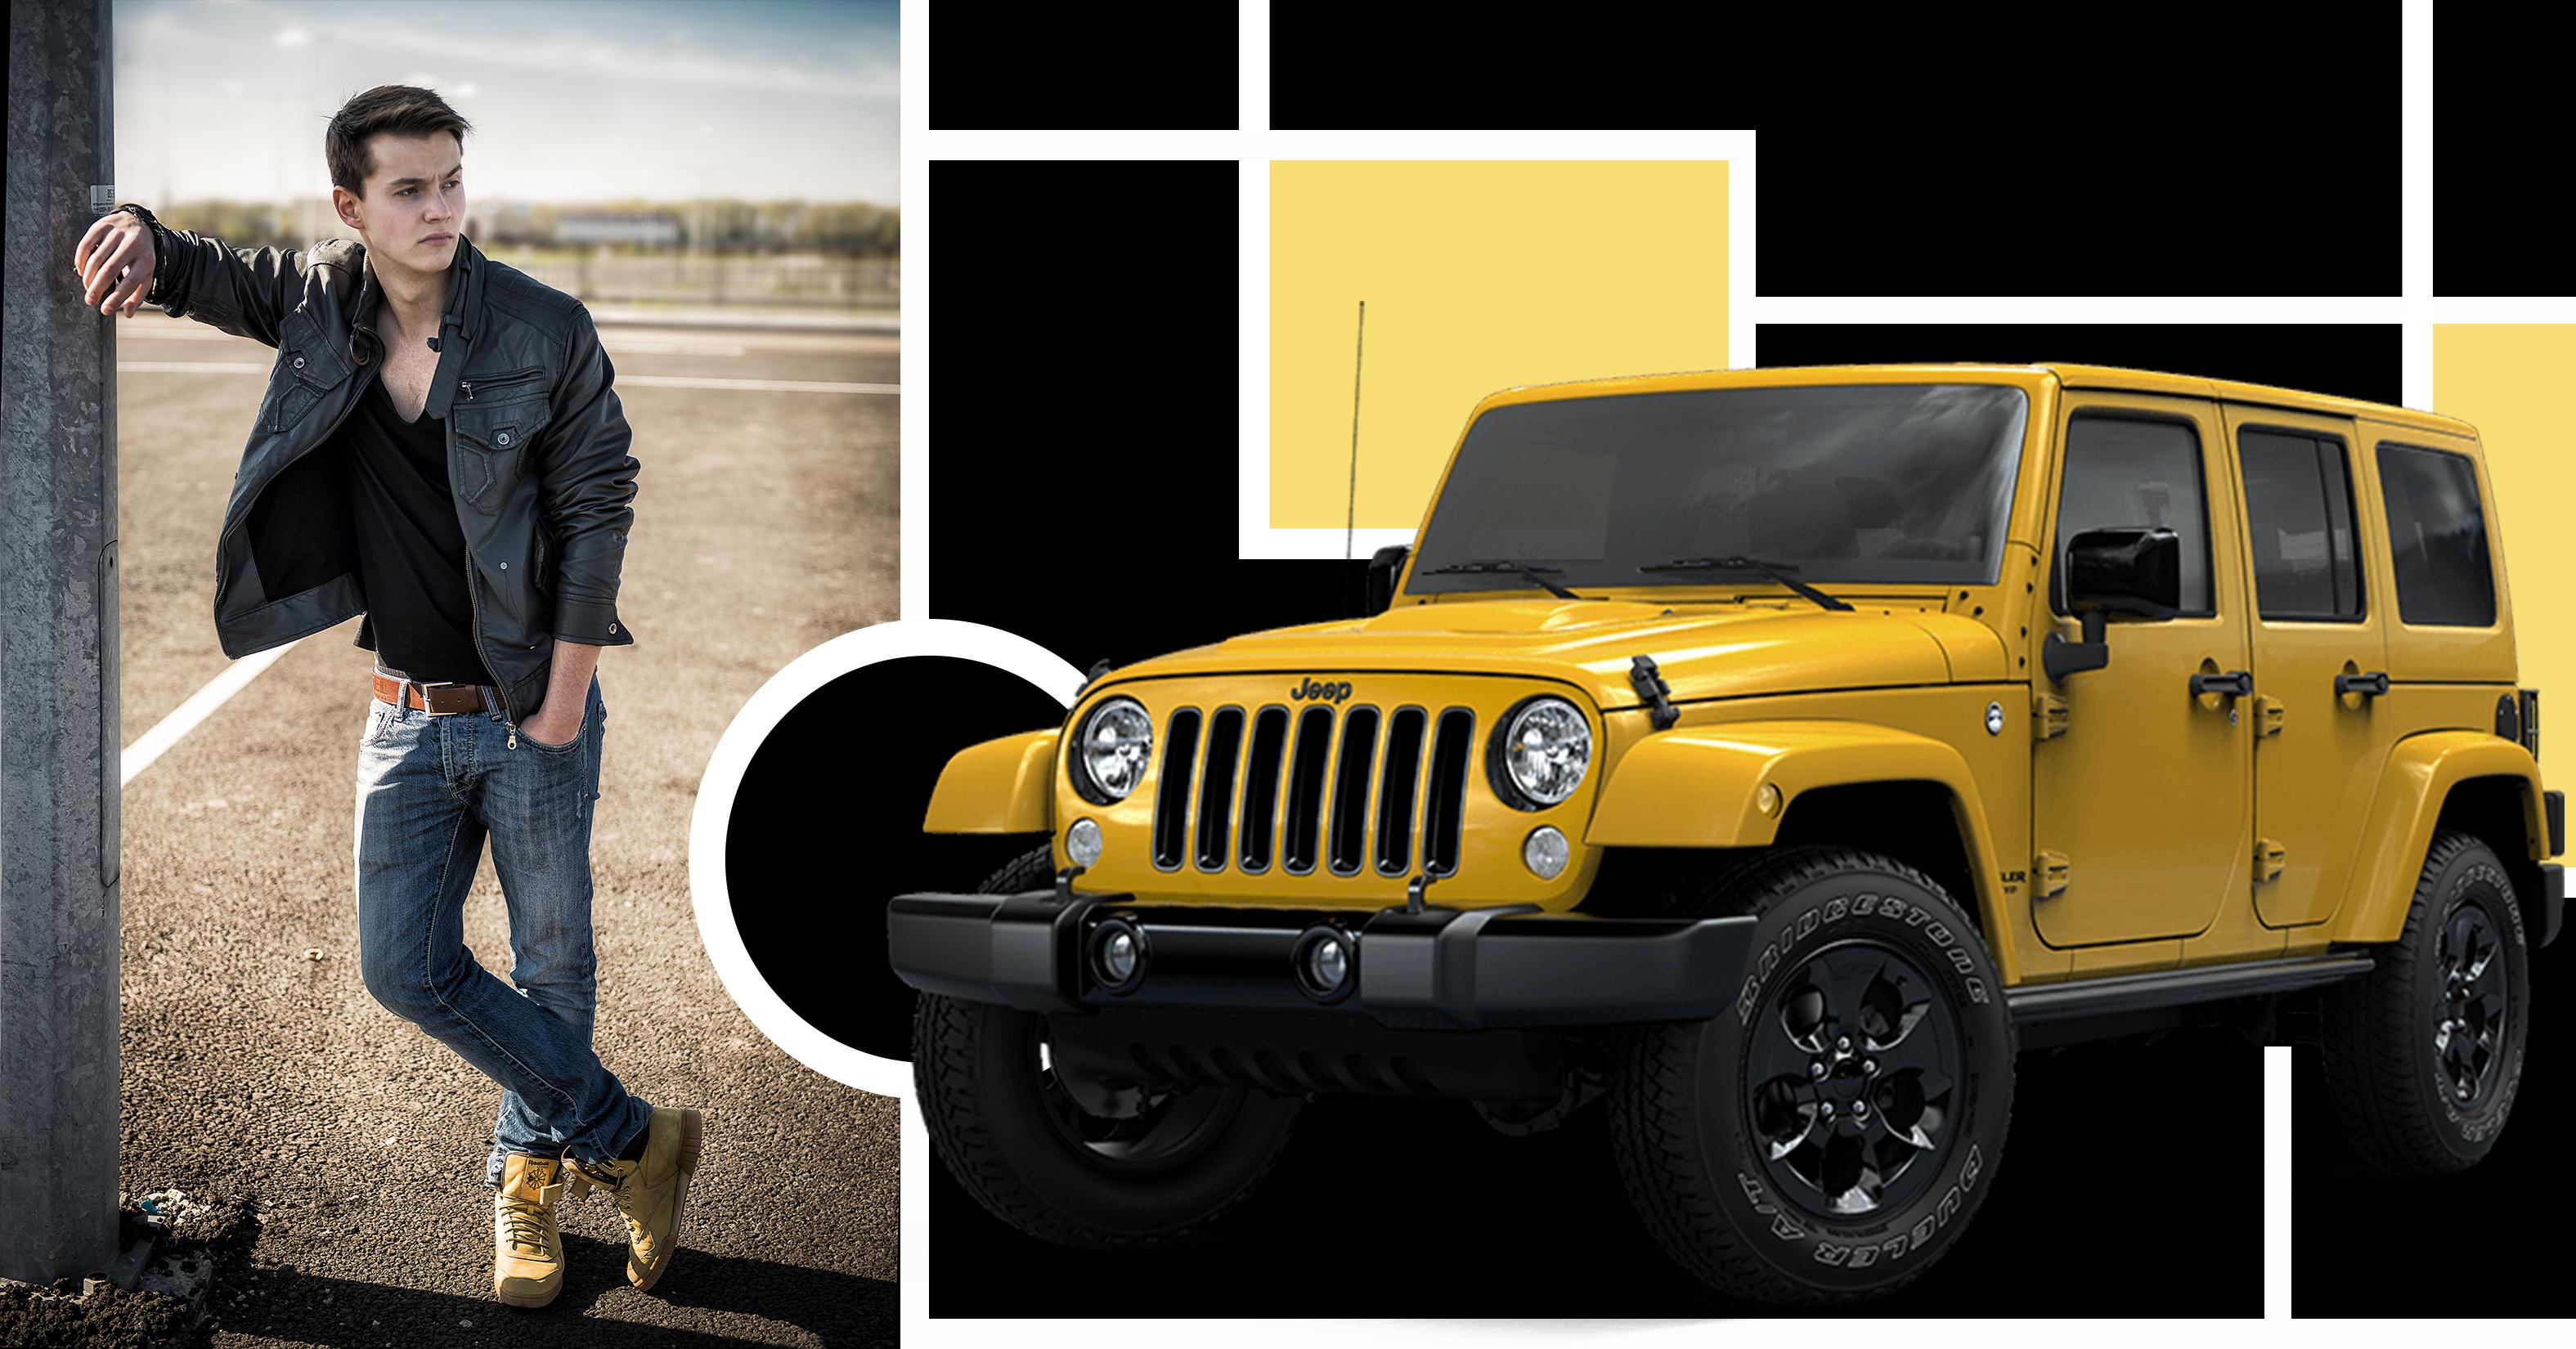 Grunge_Jeep_Wrangler_Unlimited_4x4_Fashion_Style